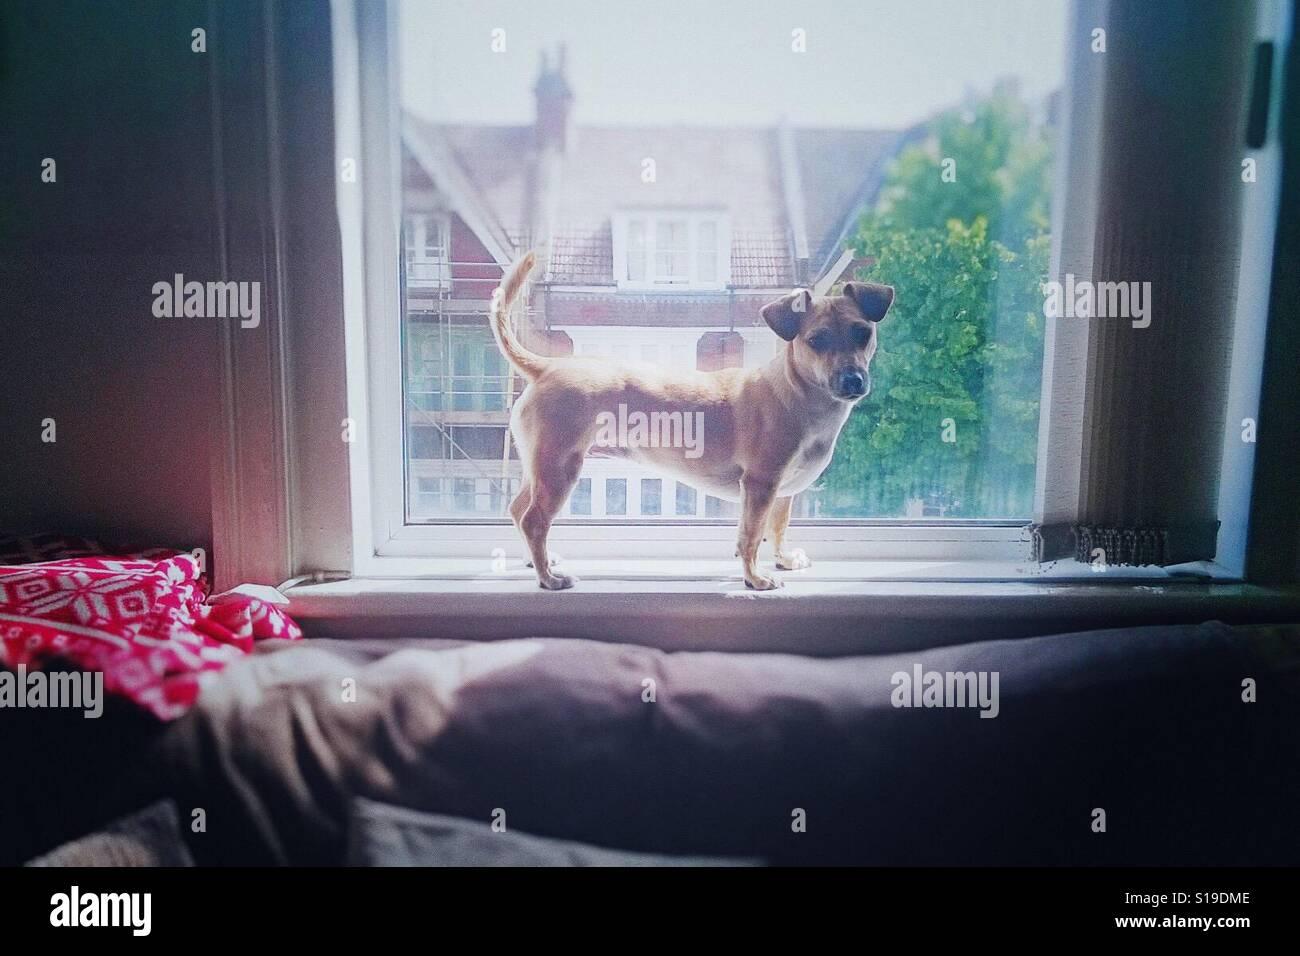 Doggy in window Stock Photo